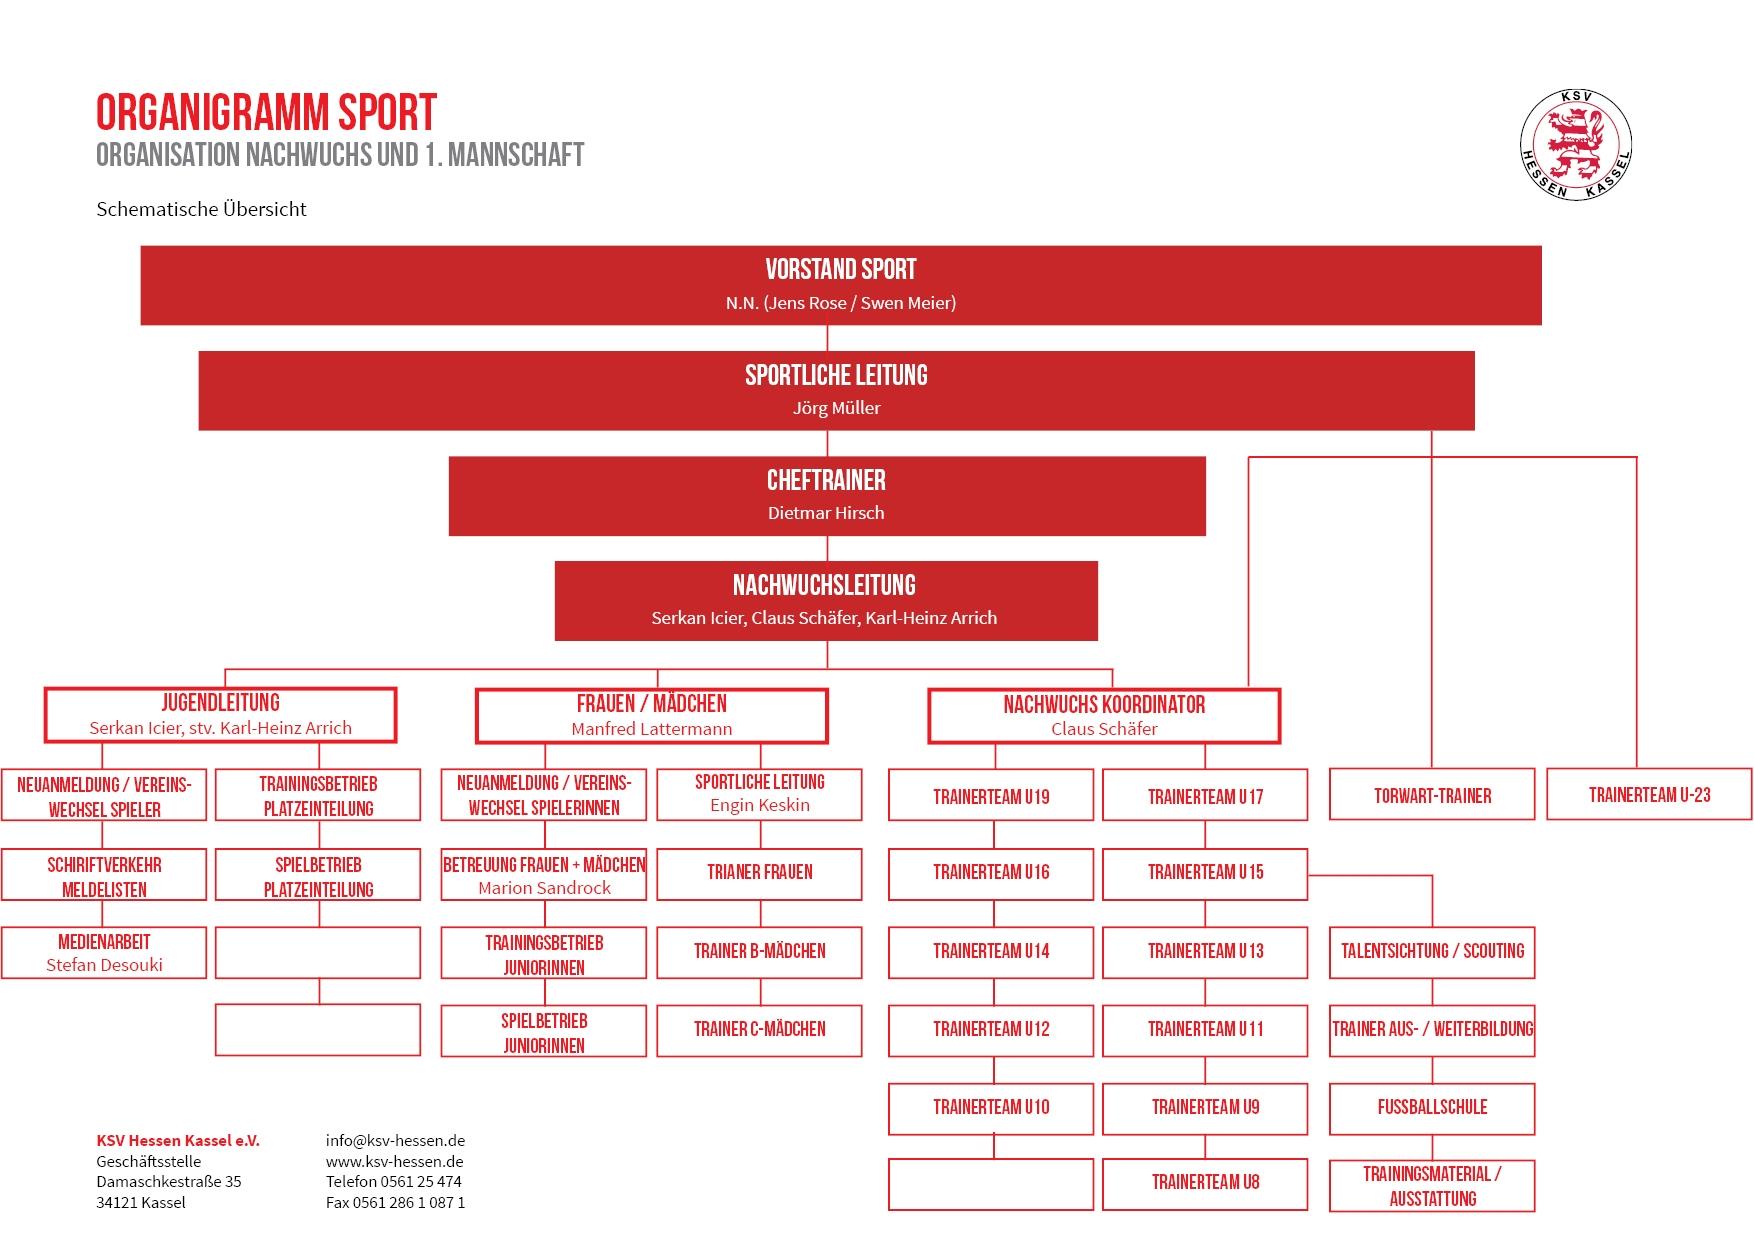 Organigramm Sport